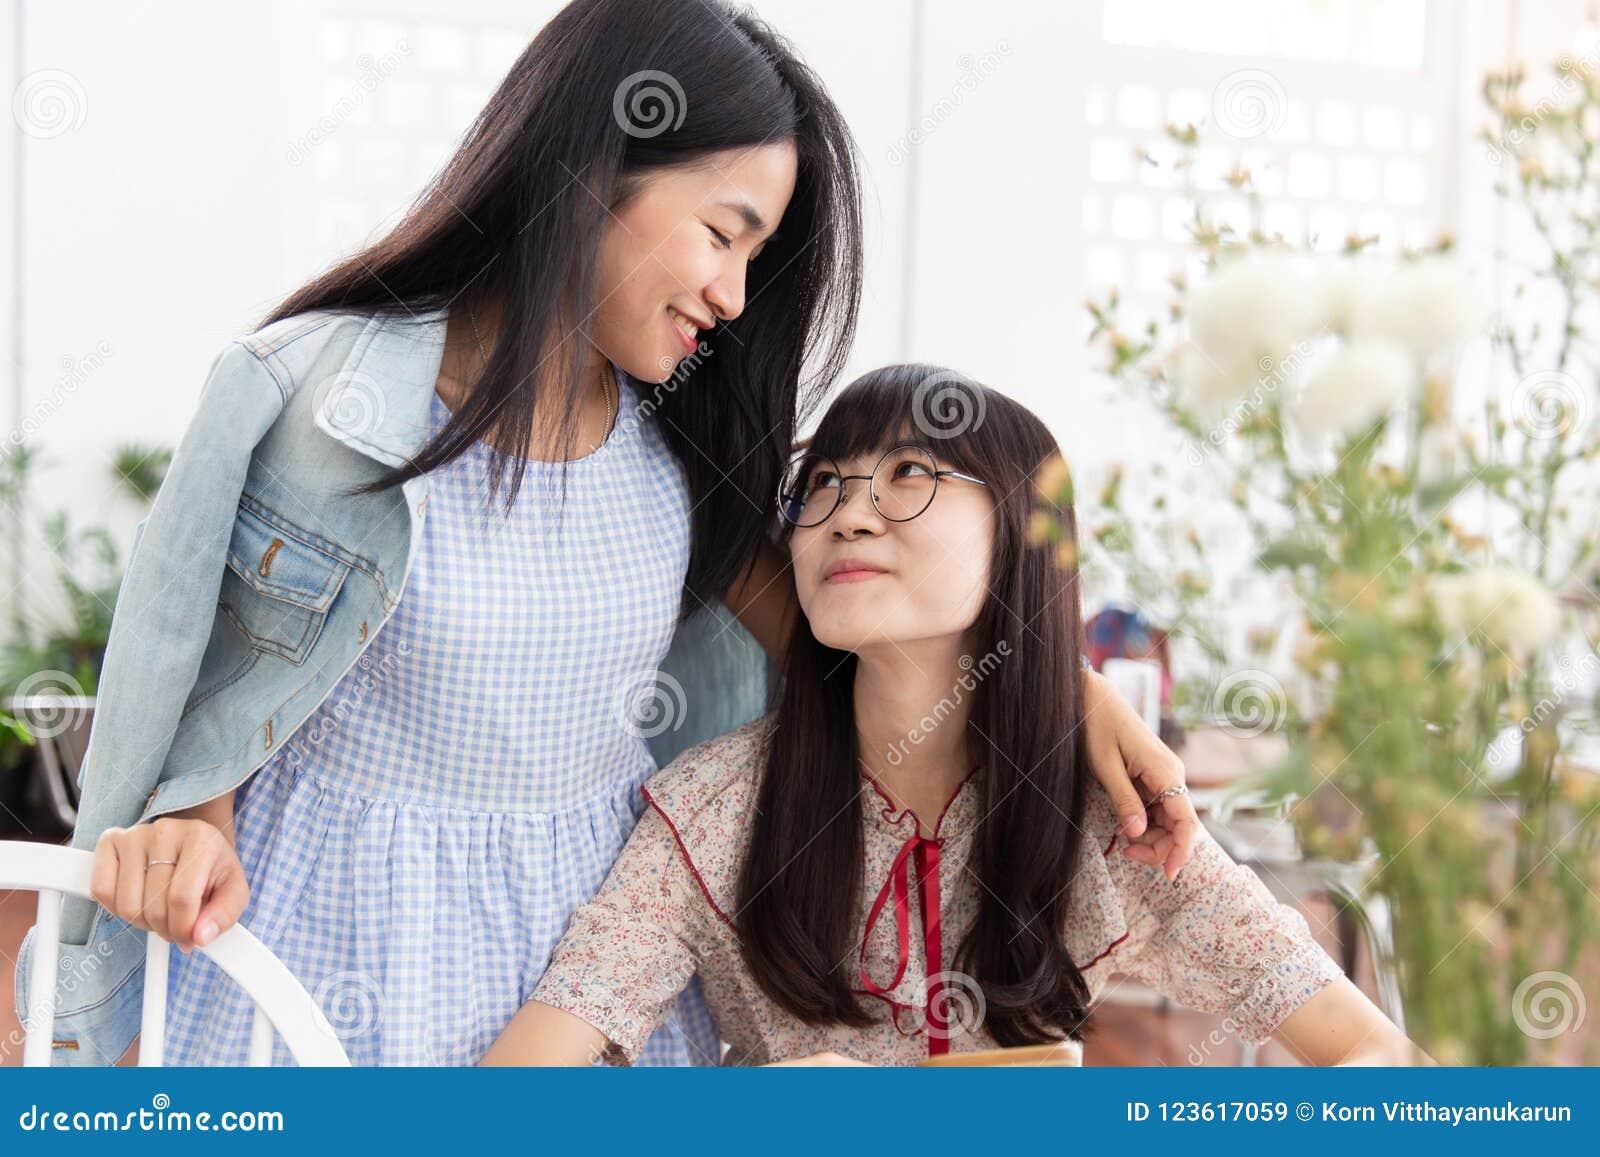 Hot lesbian asian backgrounds